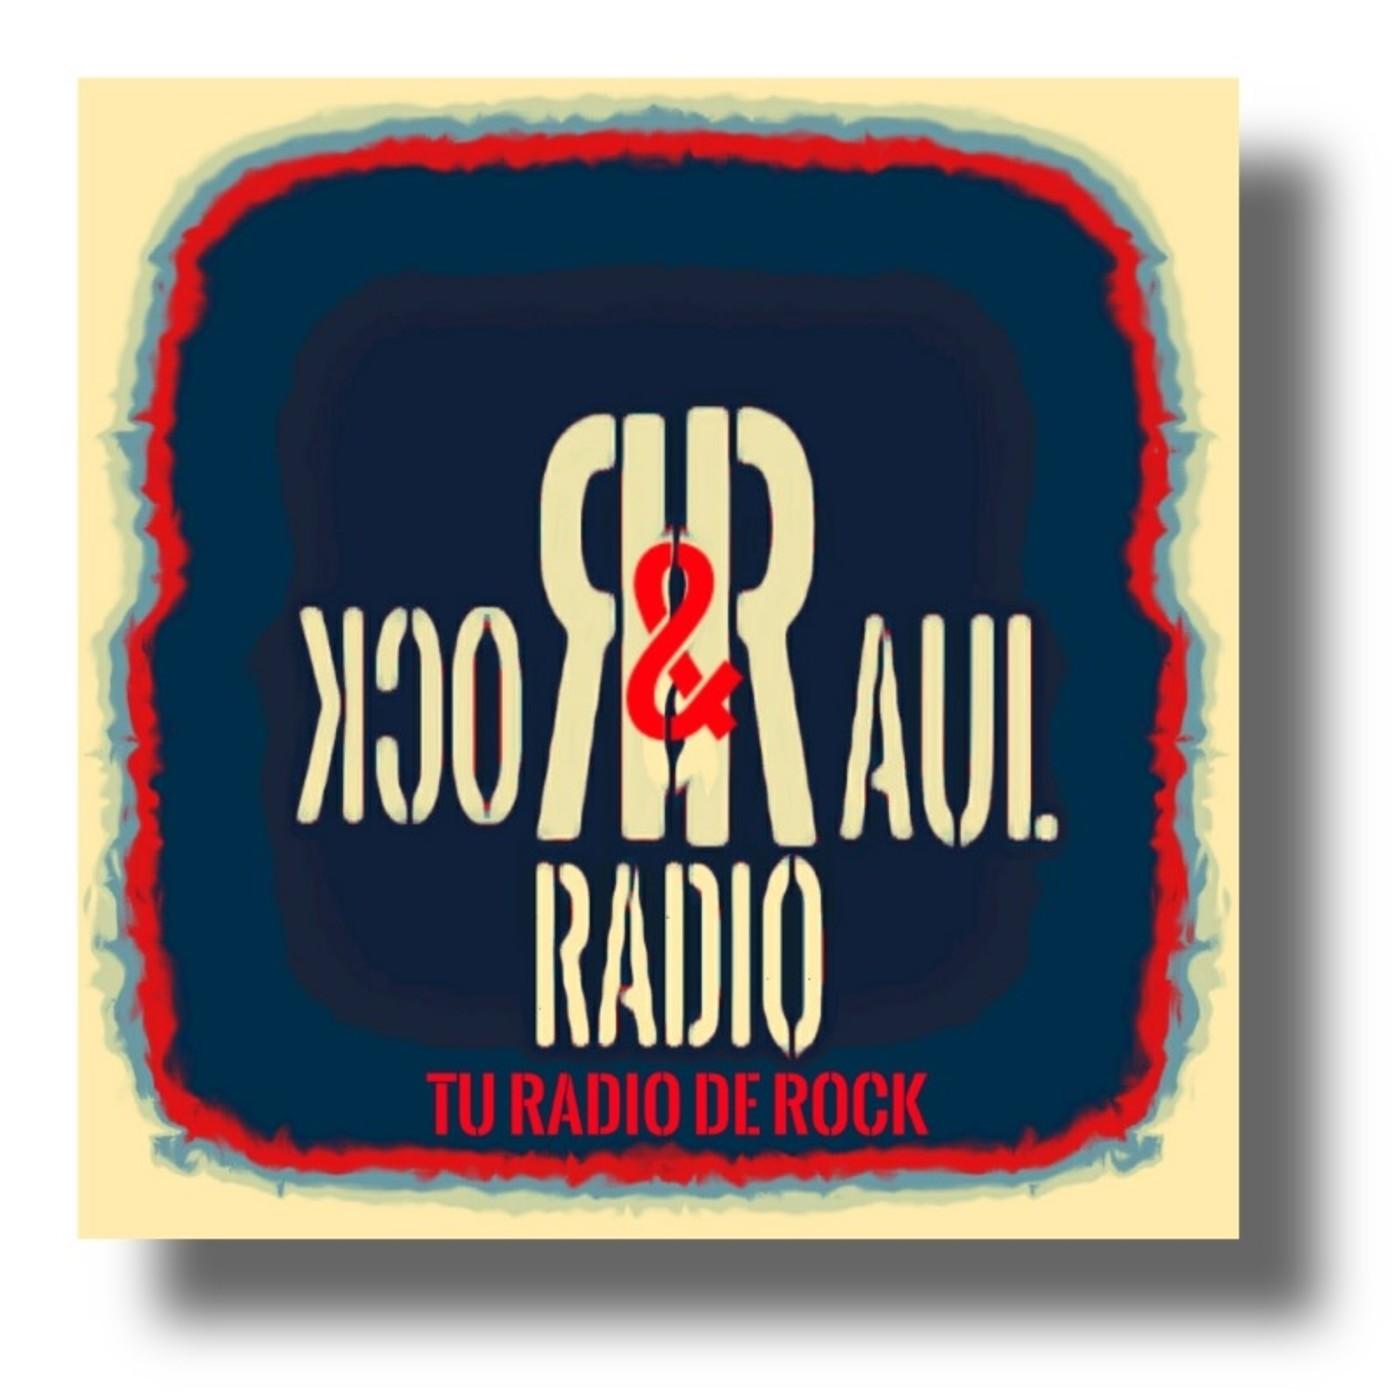 ROCK & RAUL RADIO